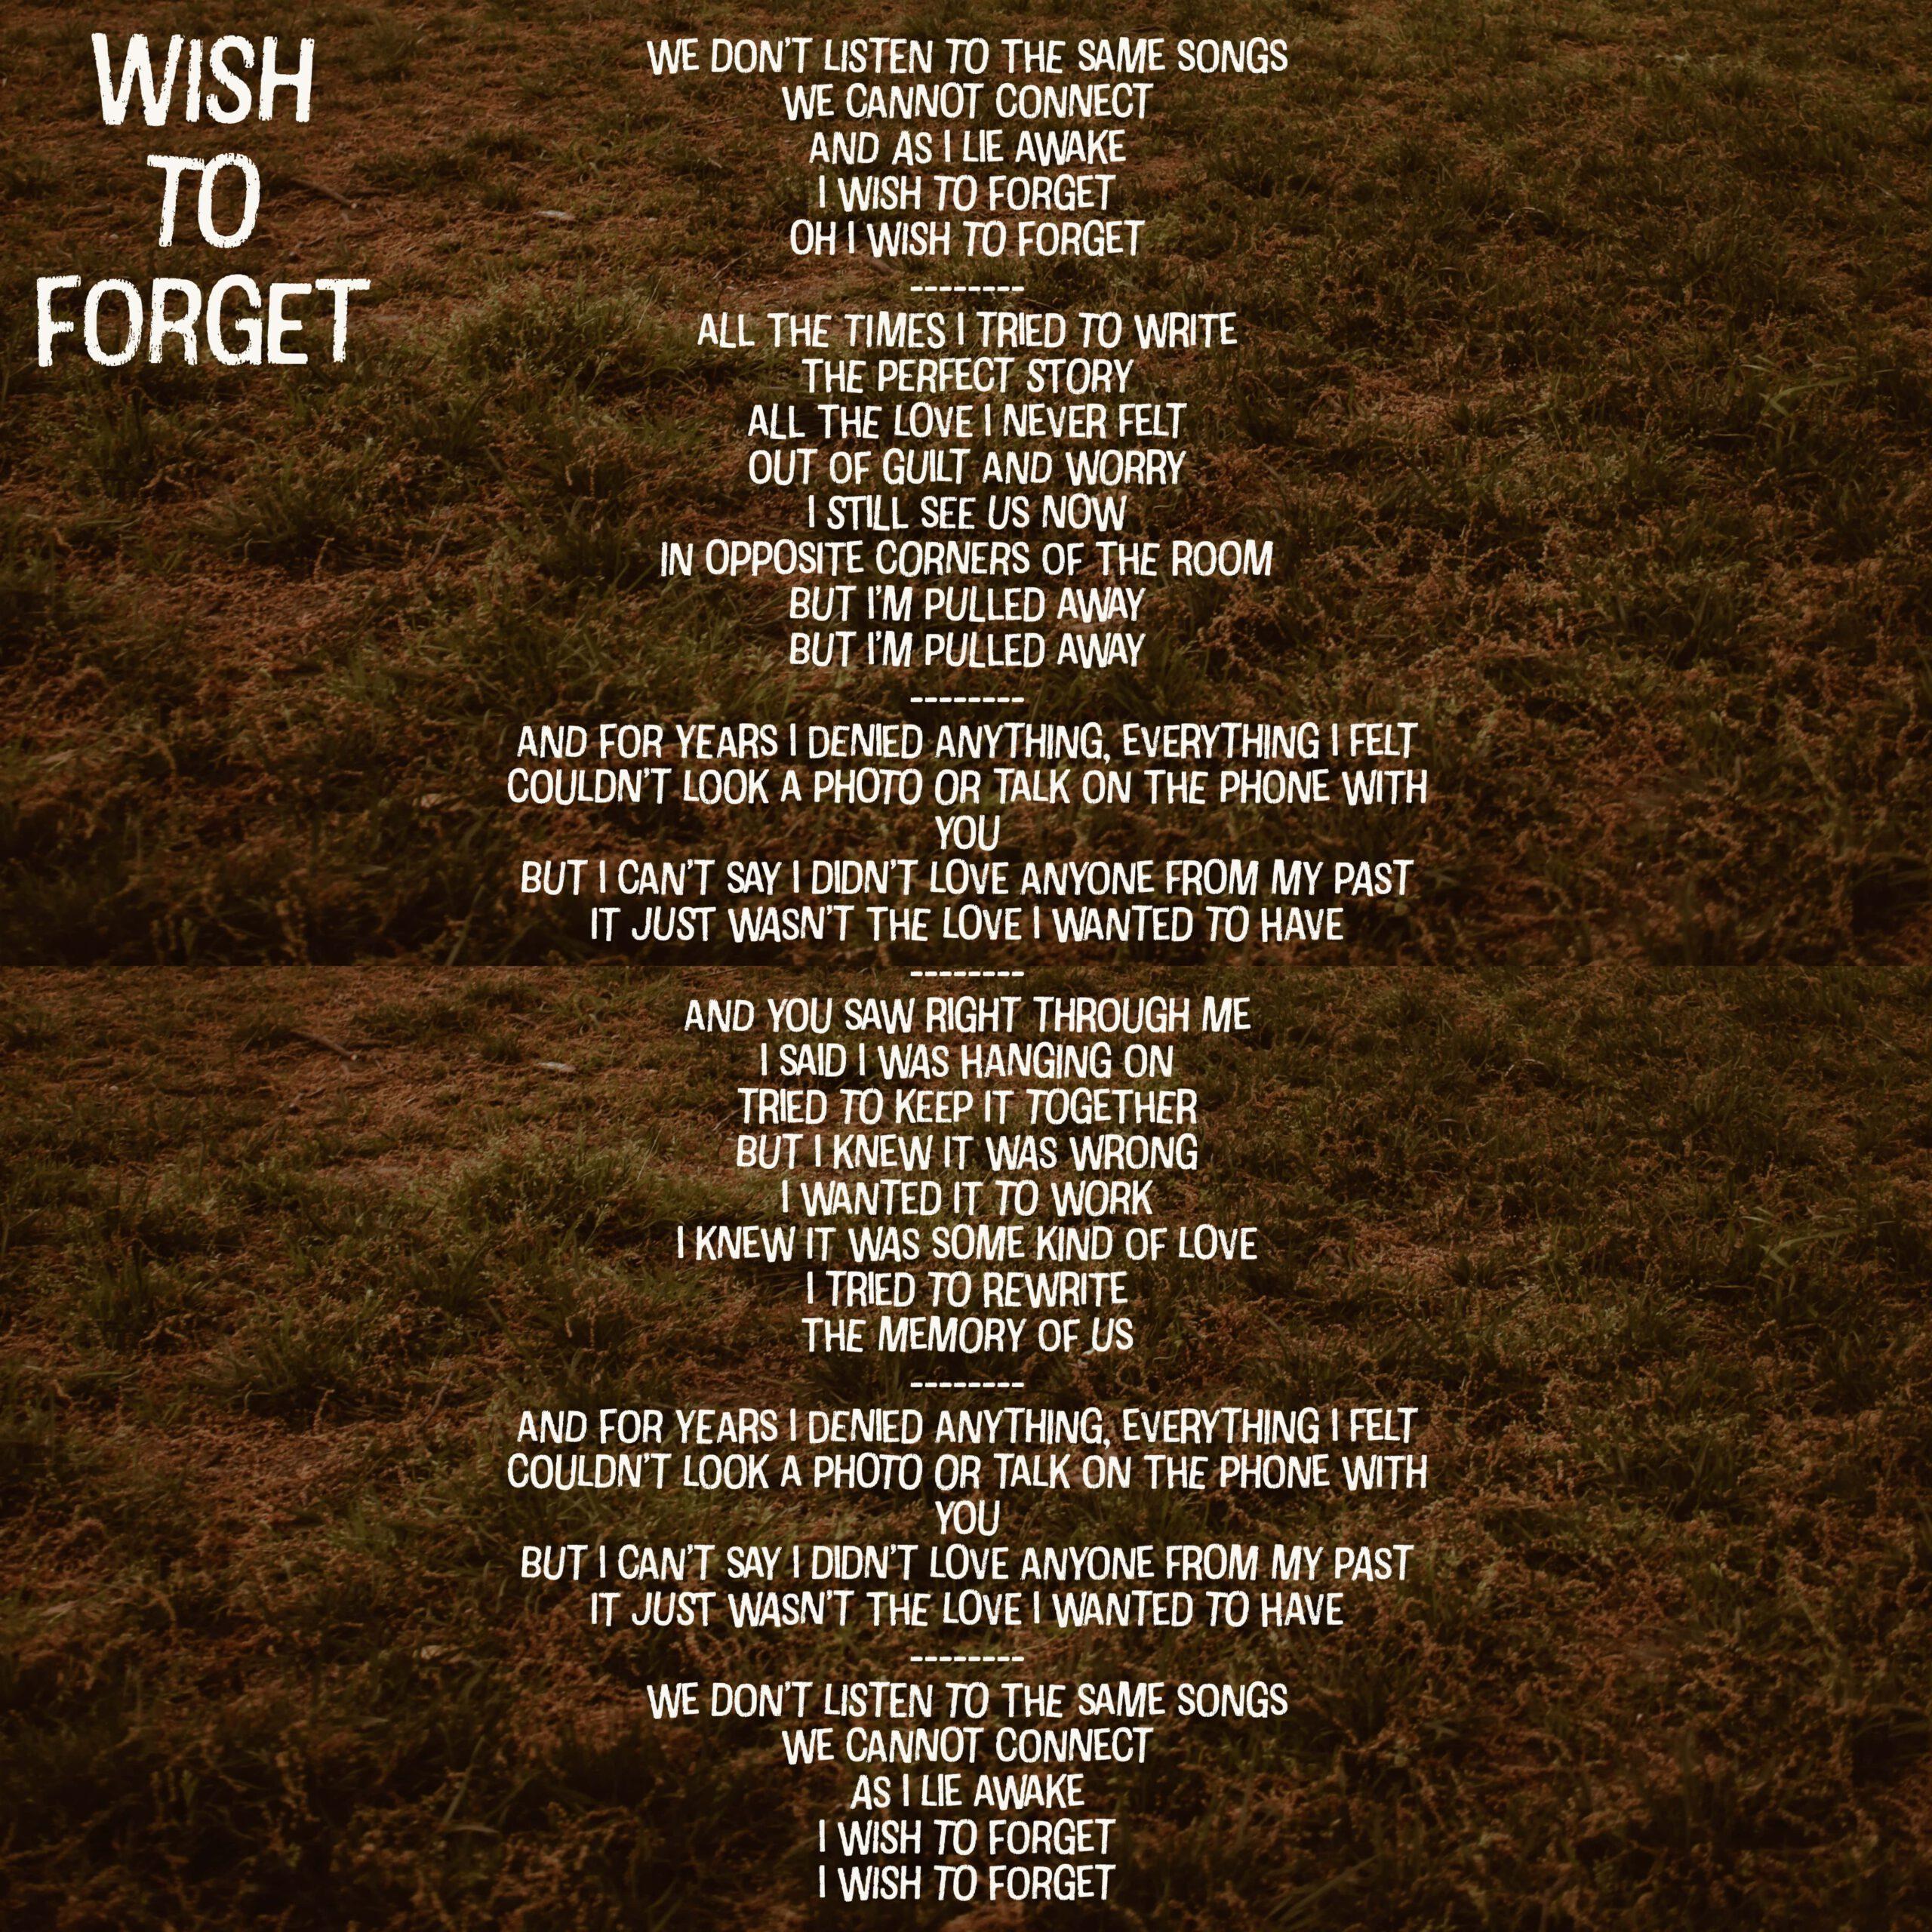 wish to forget lyrics